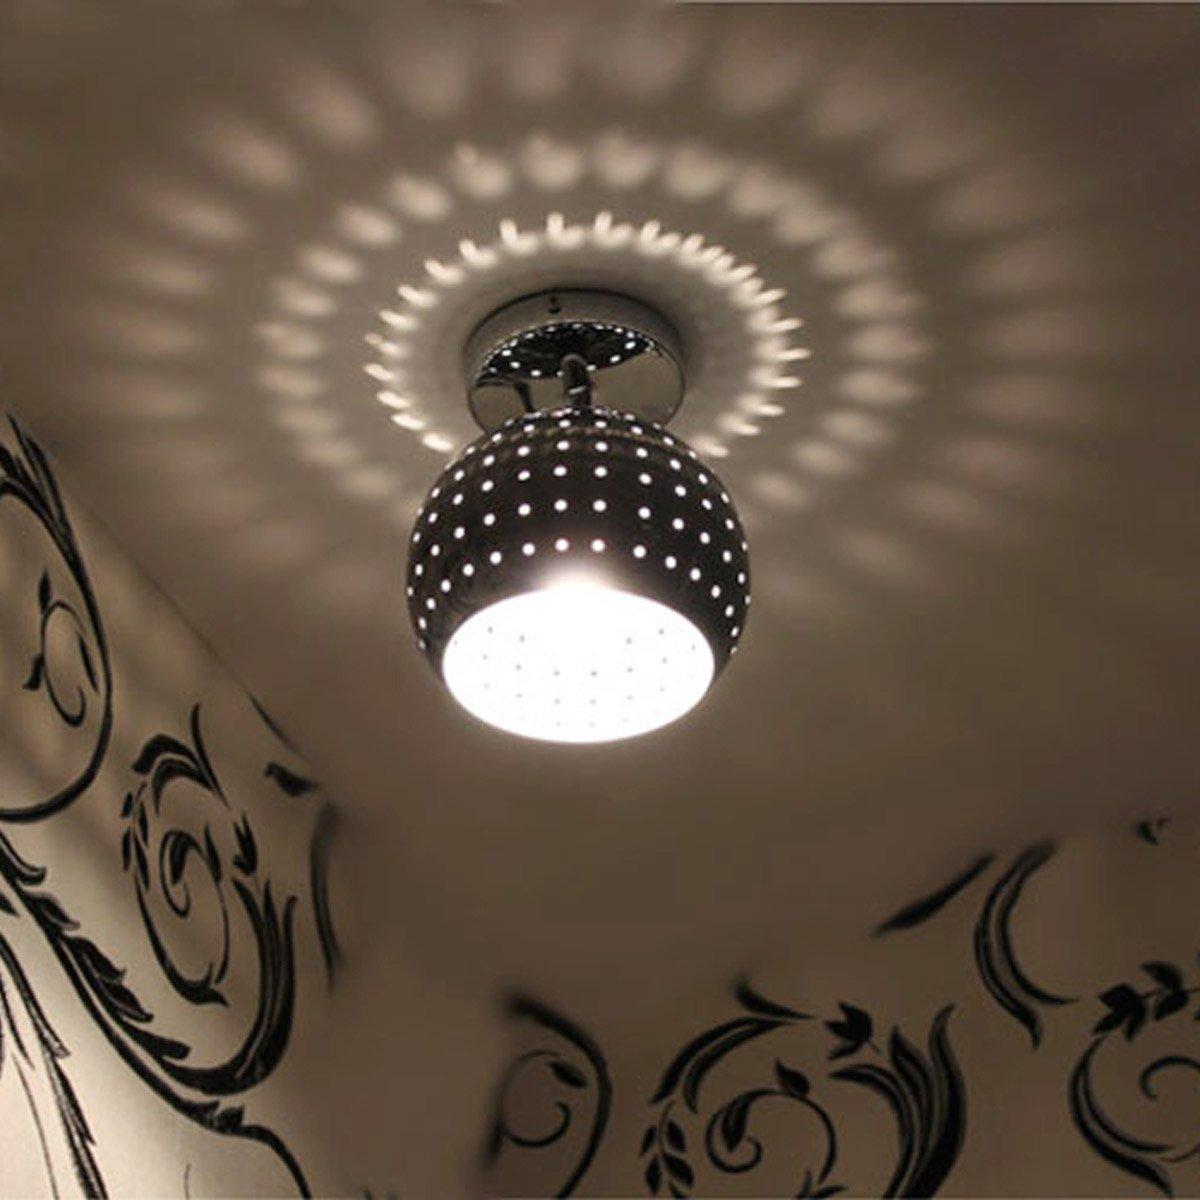 Foyer Light Switch: Amazon.com: Geekercity Modern Acrylic 6W LED Bedroom Wall